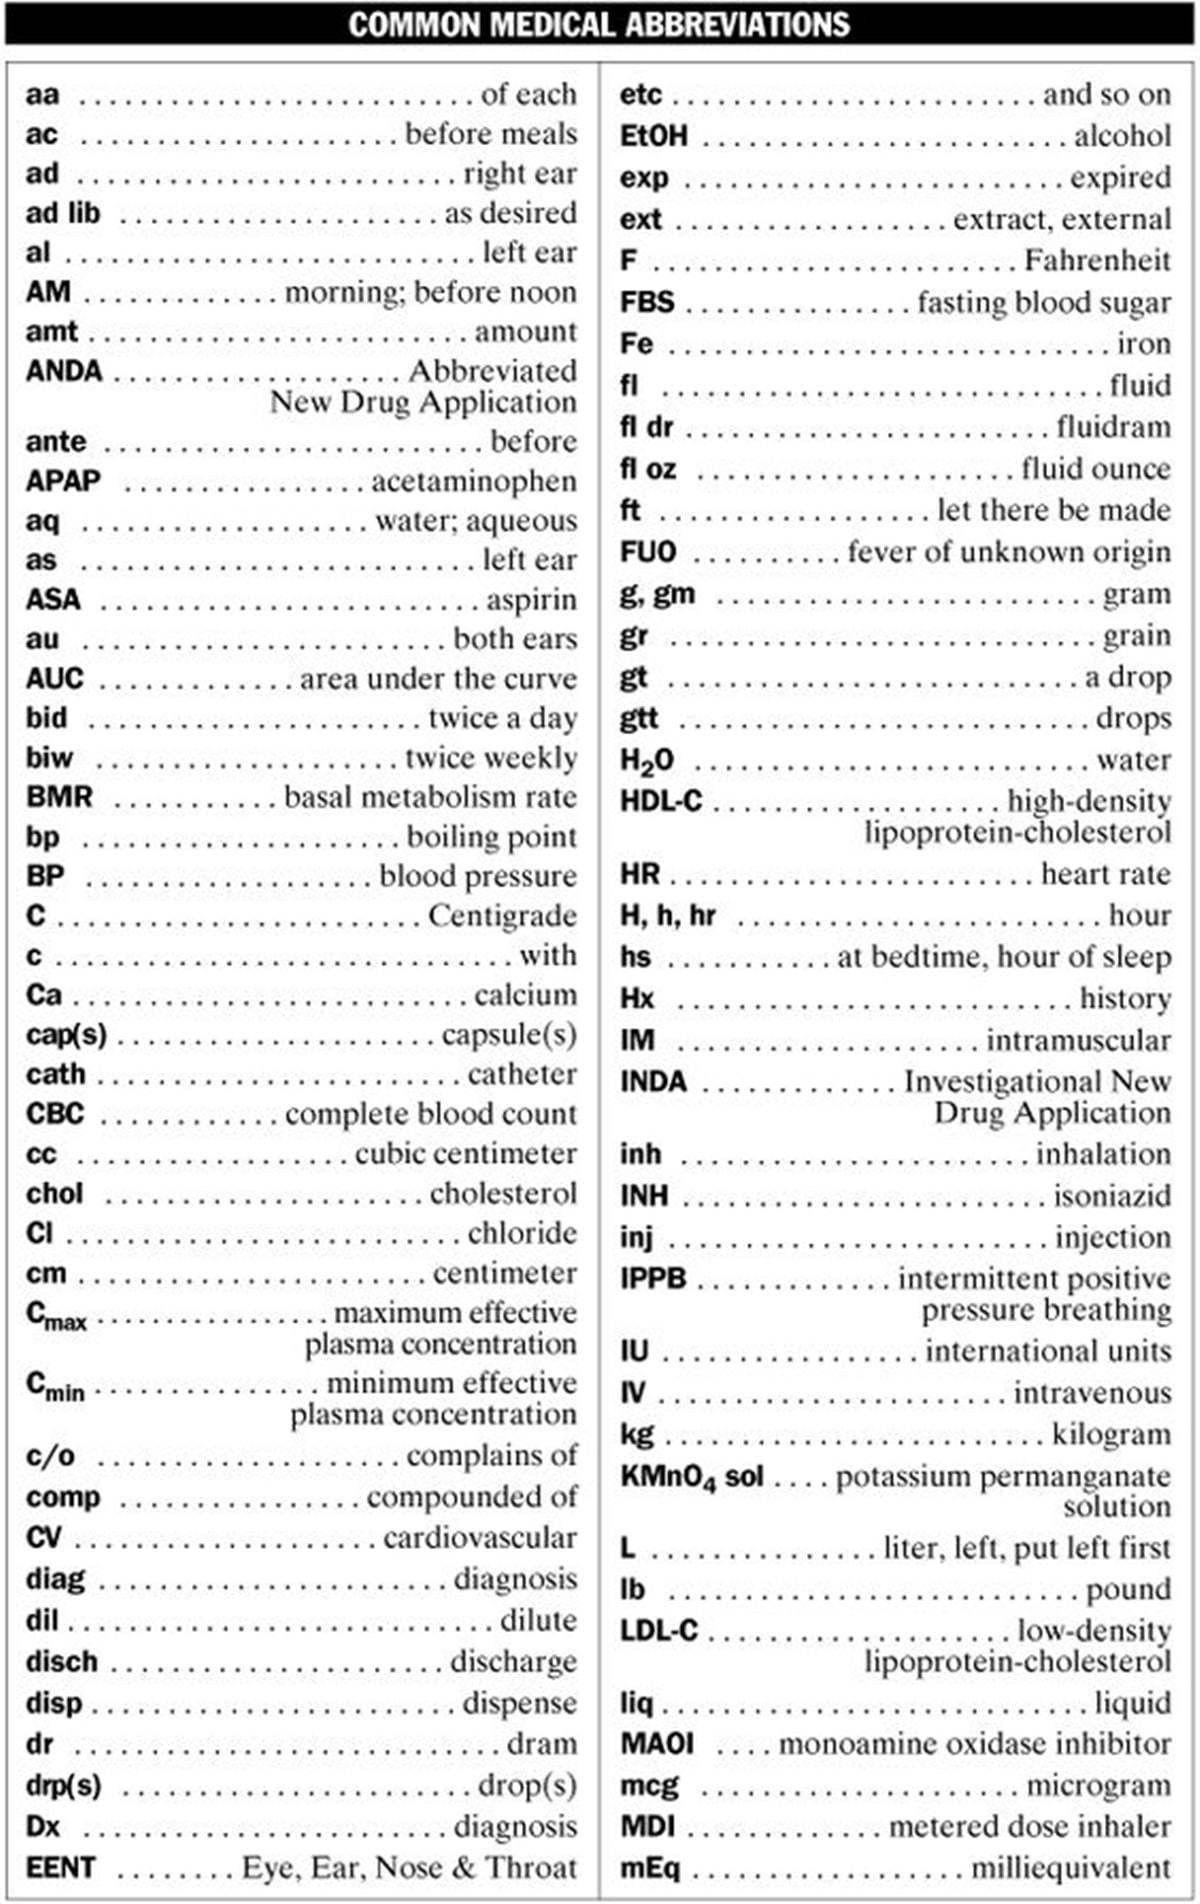 Medical Terminology Abbreviations Worksheet 50 Popular